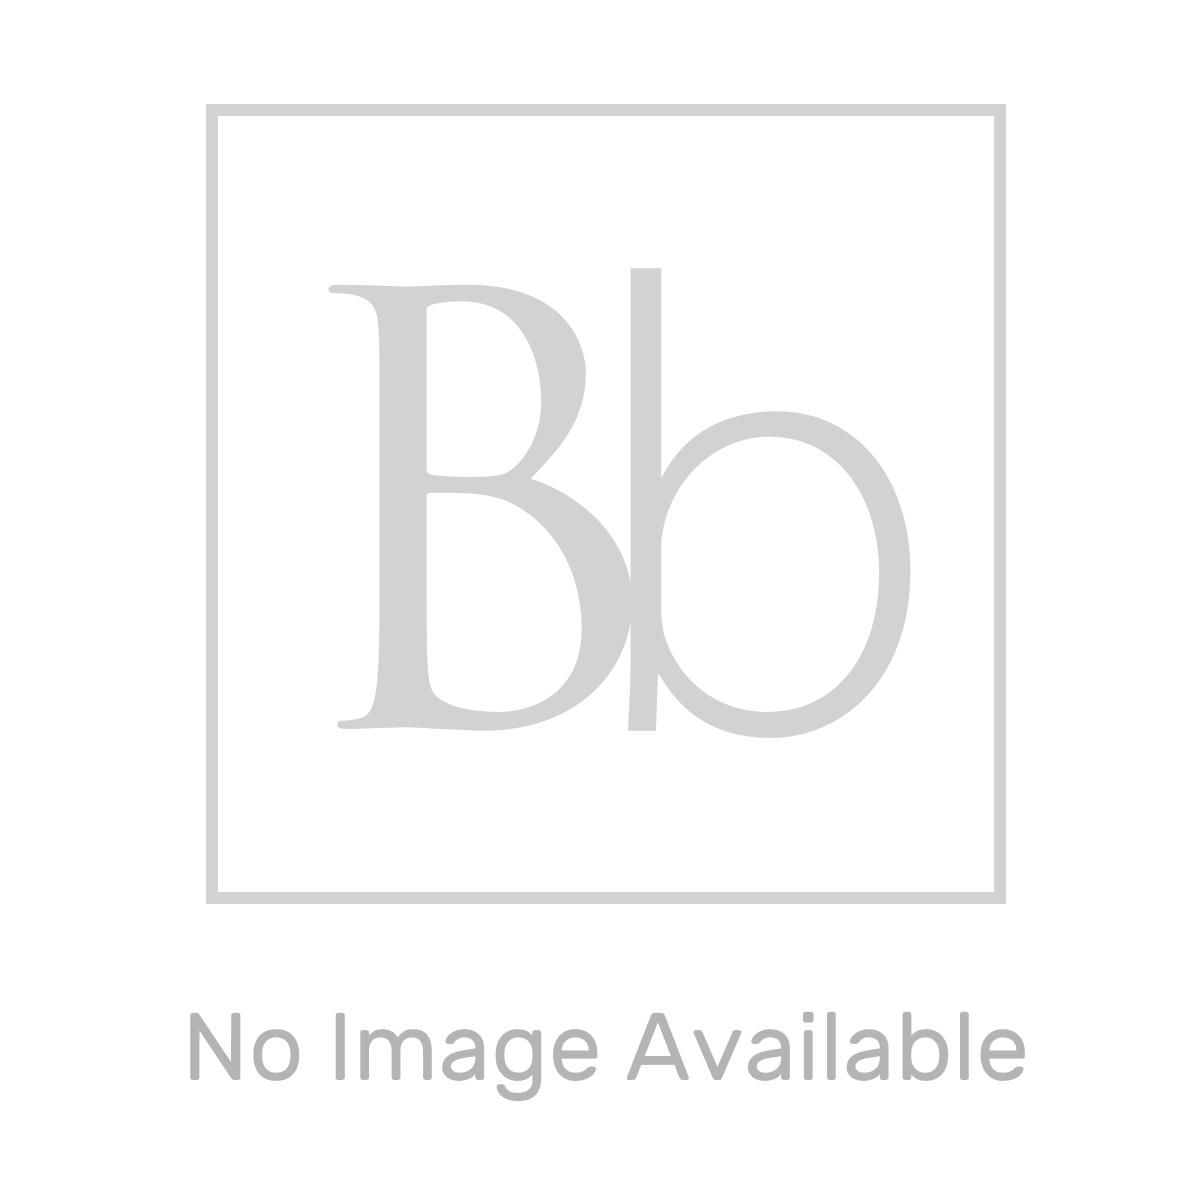 Frontline Tudor White Bath Front Panel 1700mm